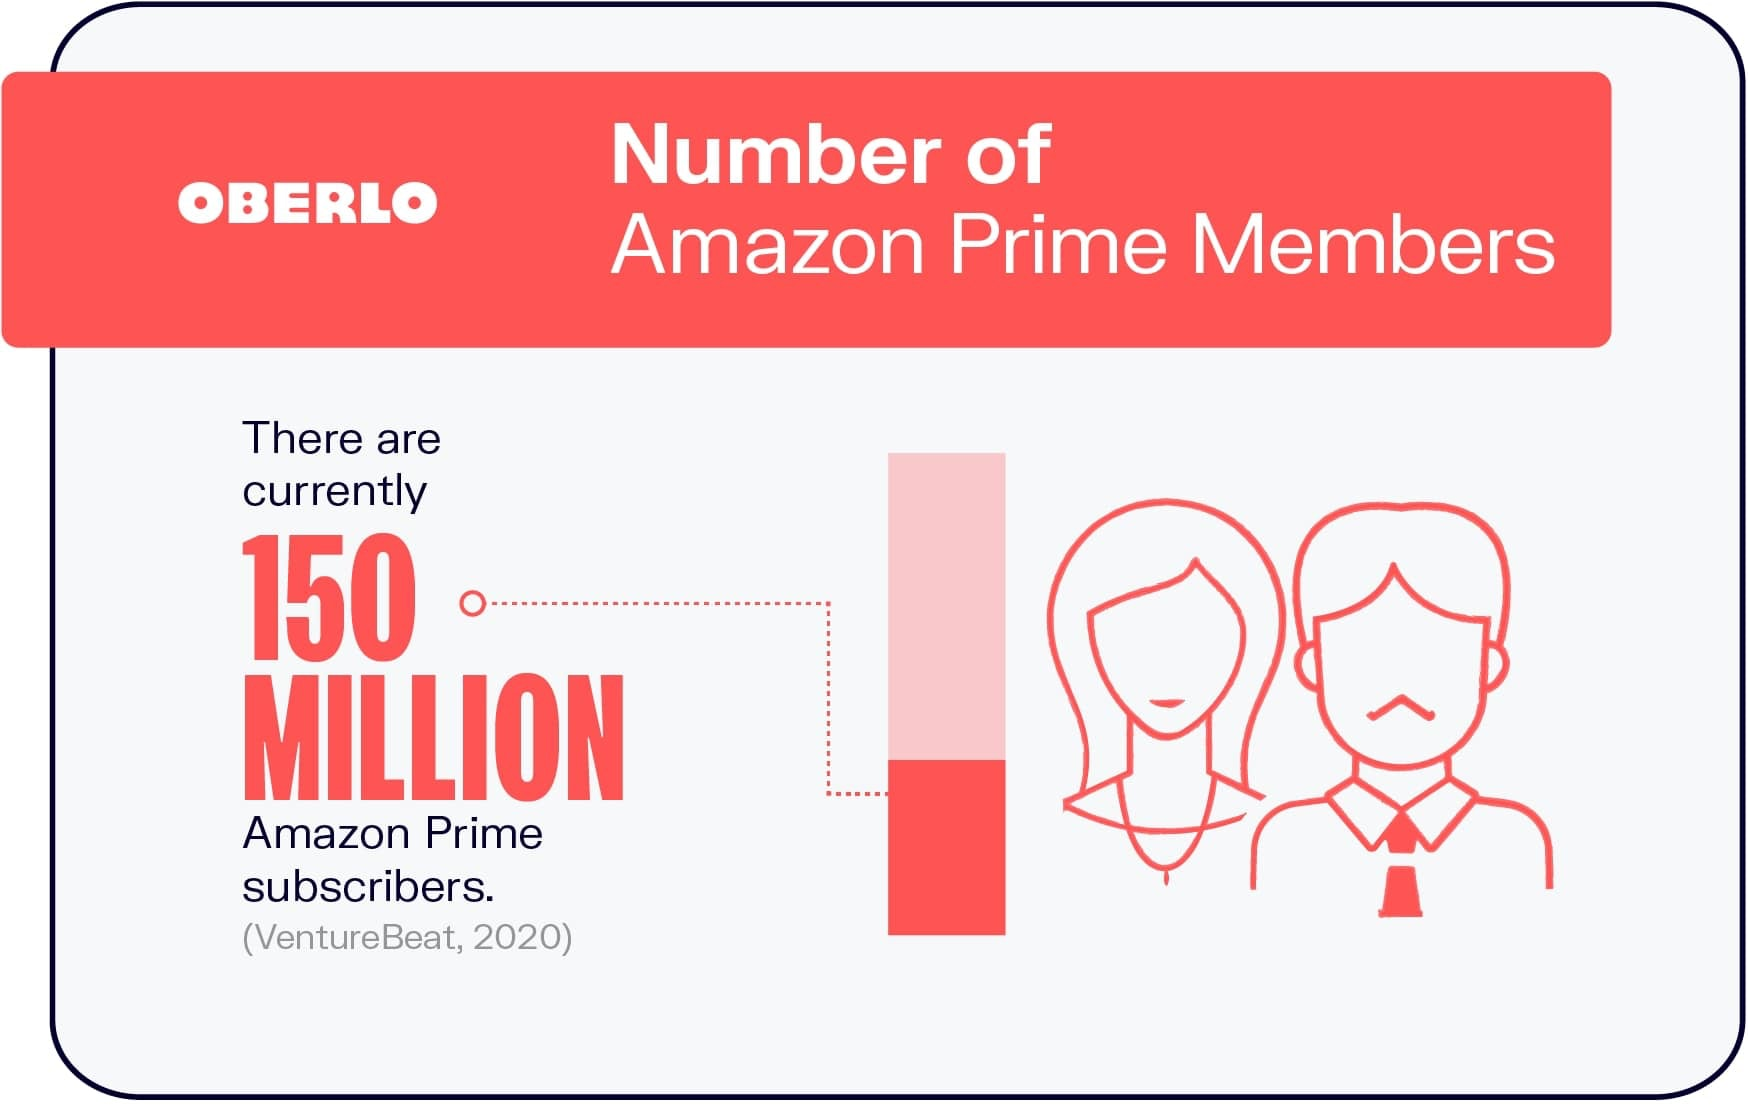 Number of Amazon Prime Members